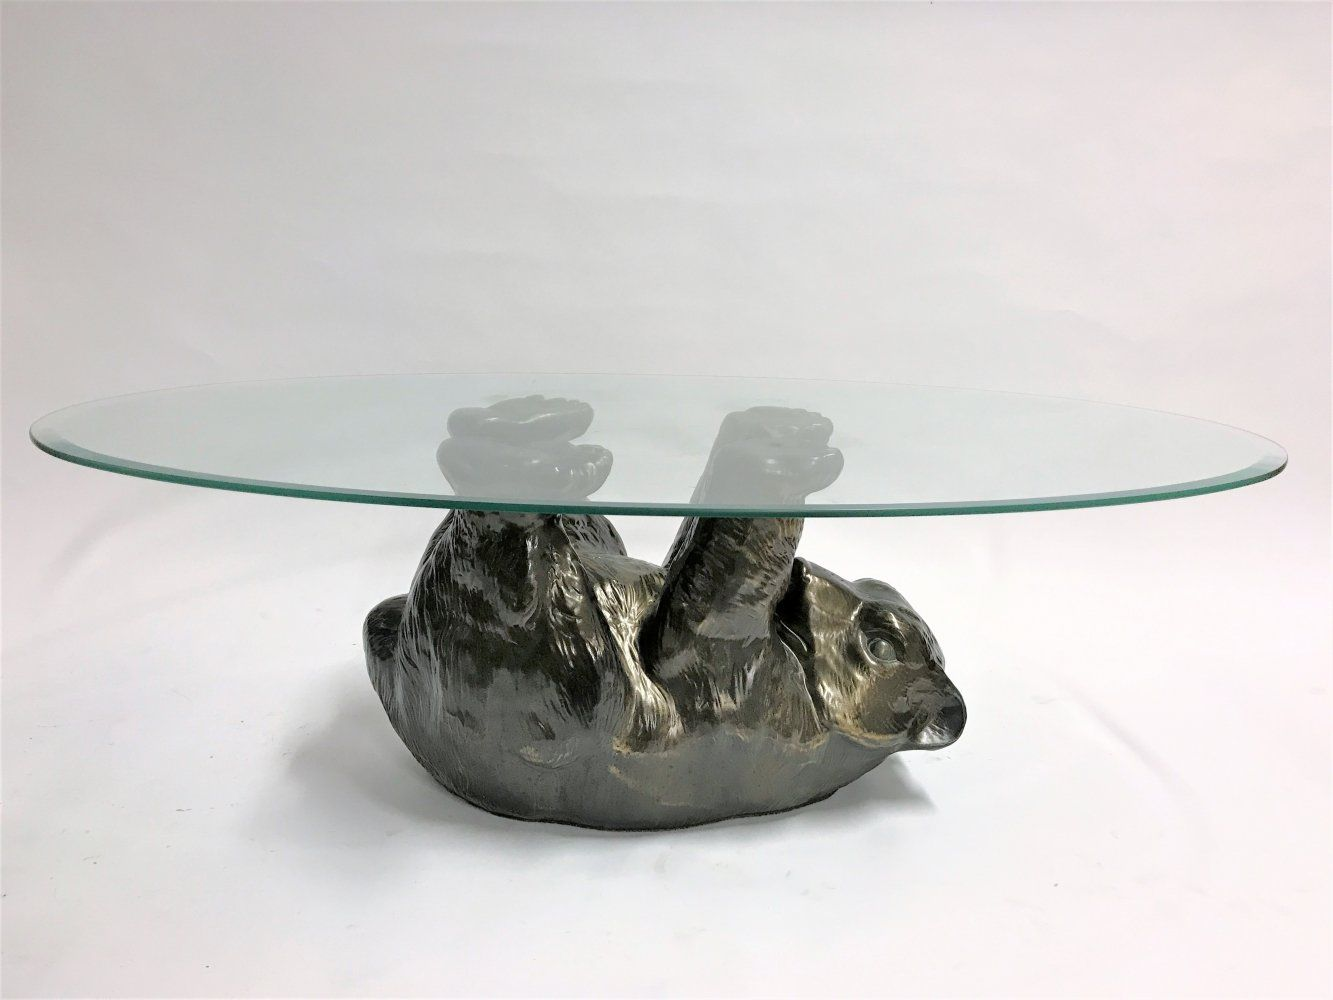 For Sale Unique Sculptural Black Bear Coffee Table 1970s Met